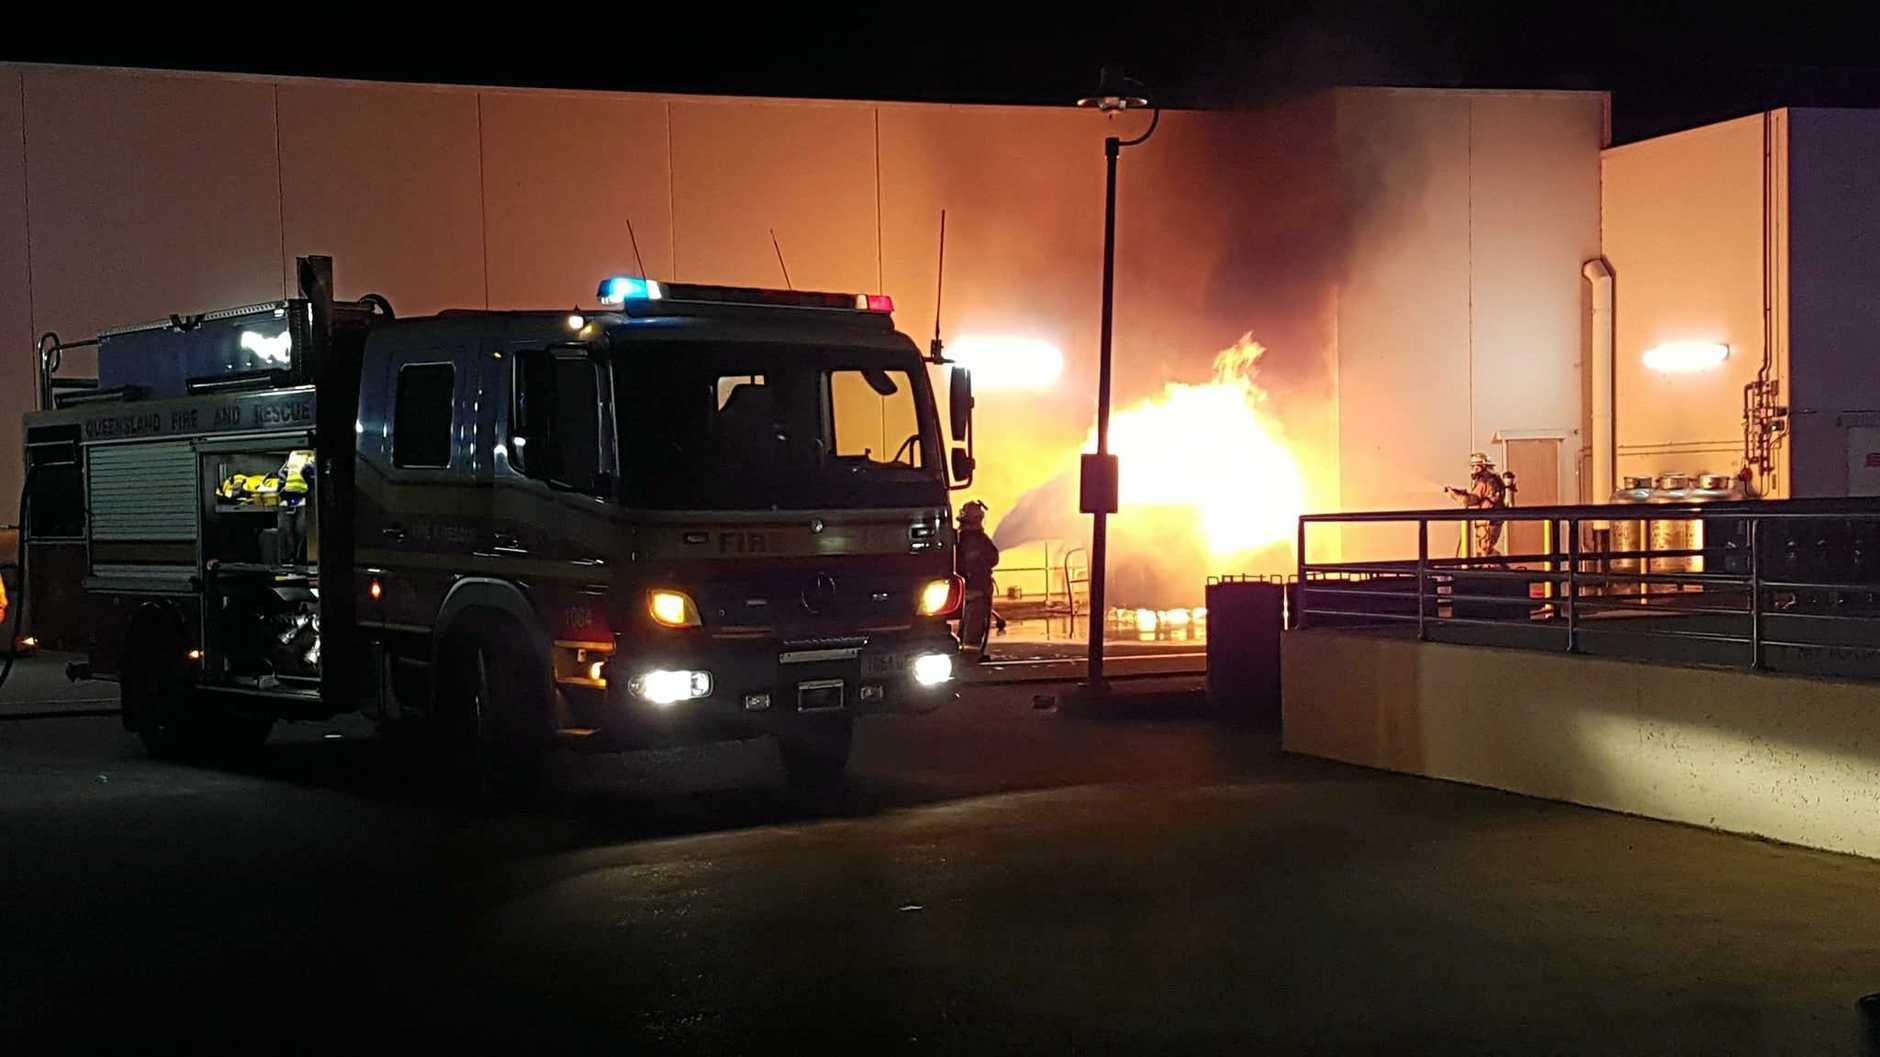 TERROR: Flames engulfed three industrial recycling bins full of cardboard in the car par of Rose City Shoppingworld last night.